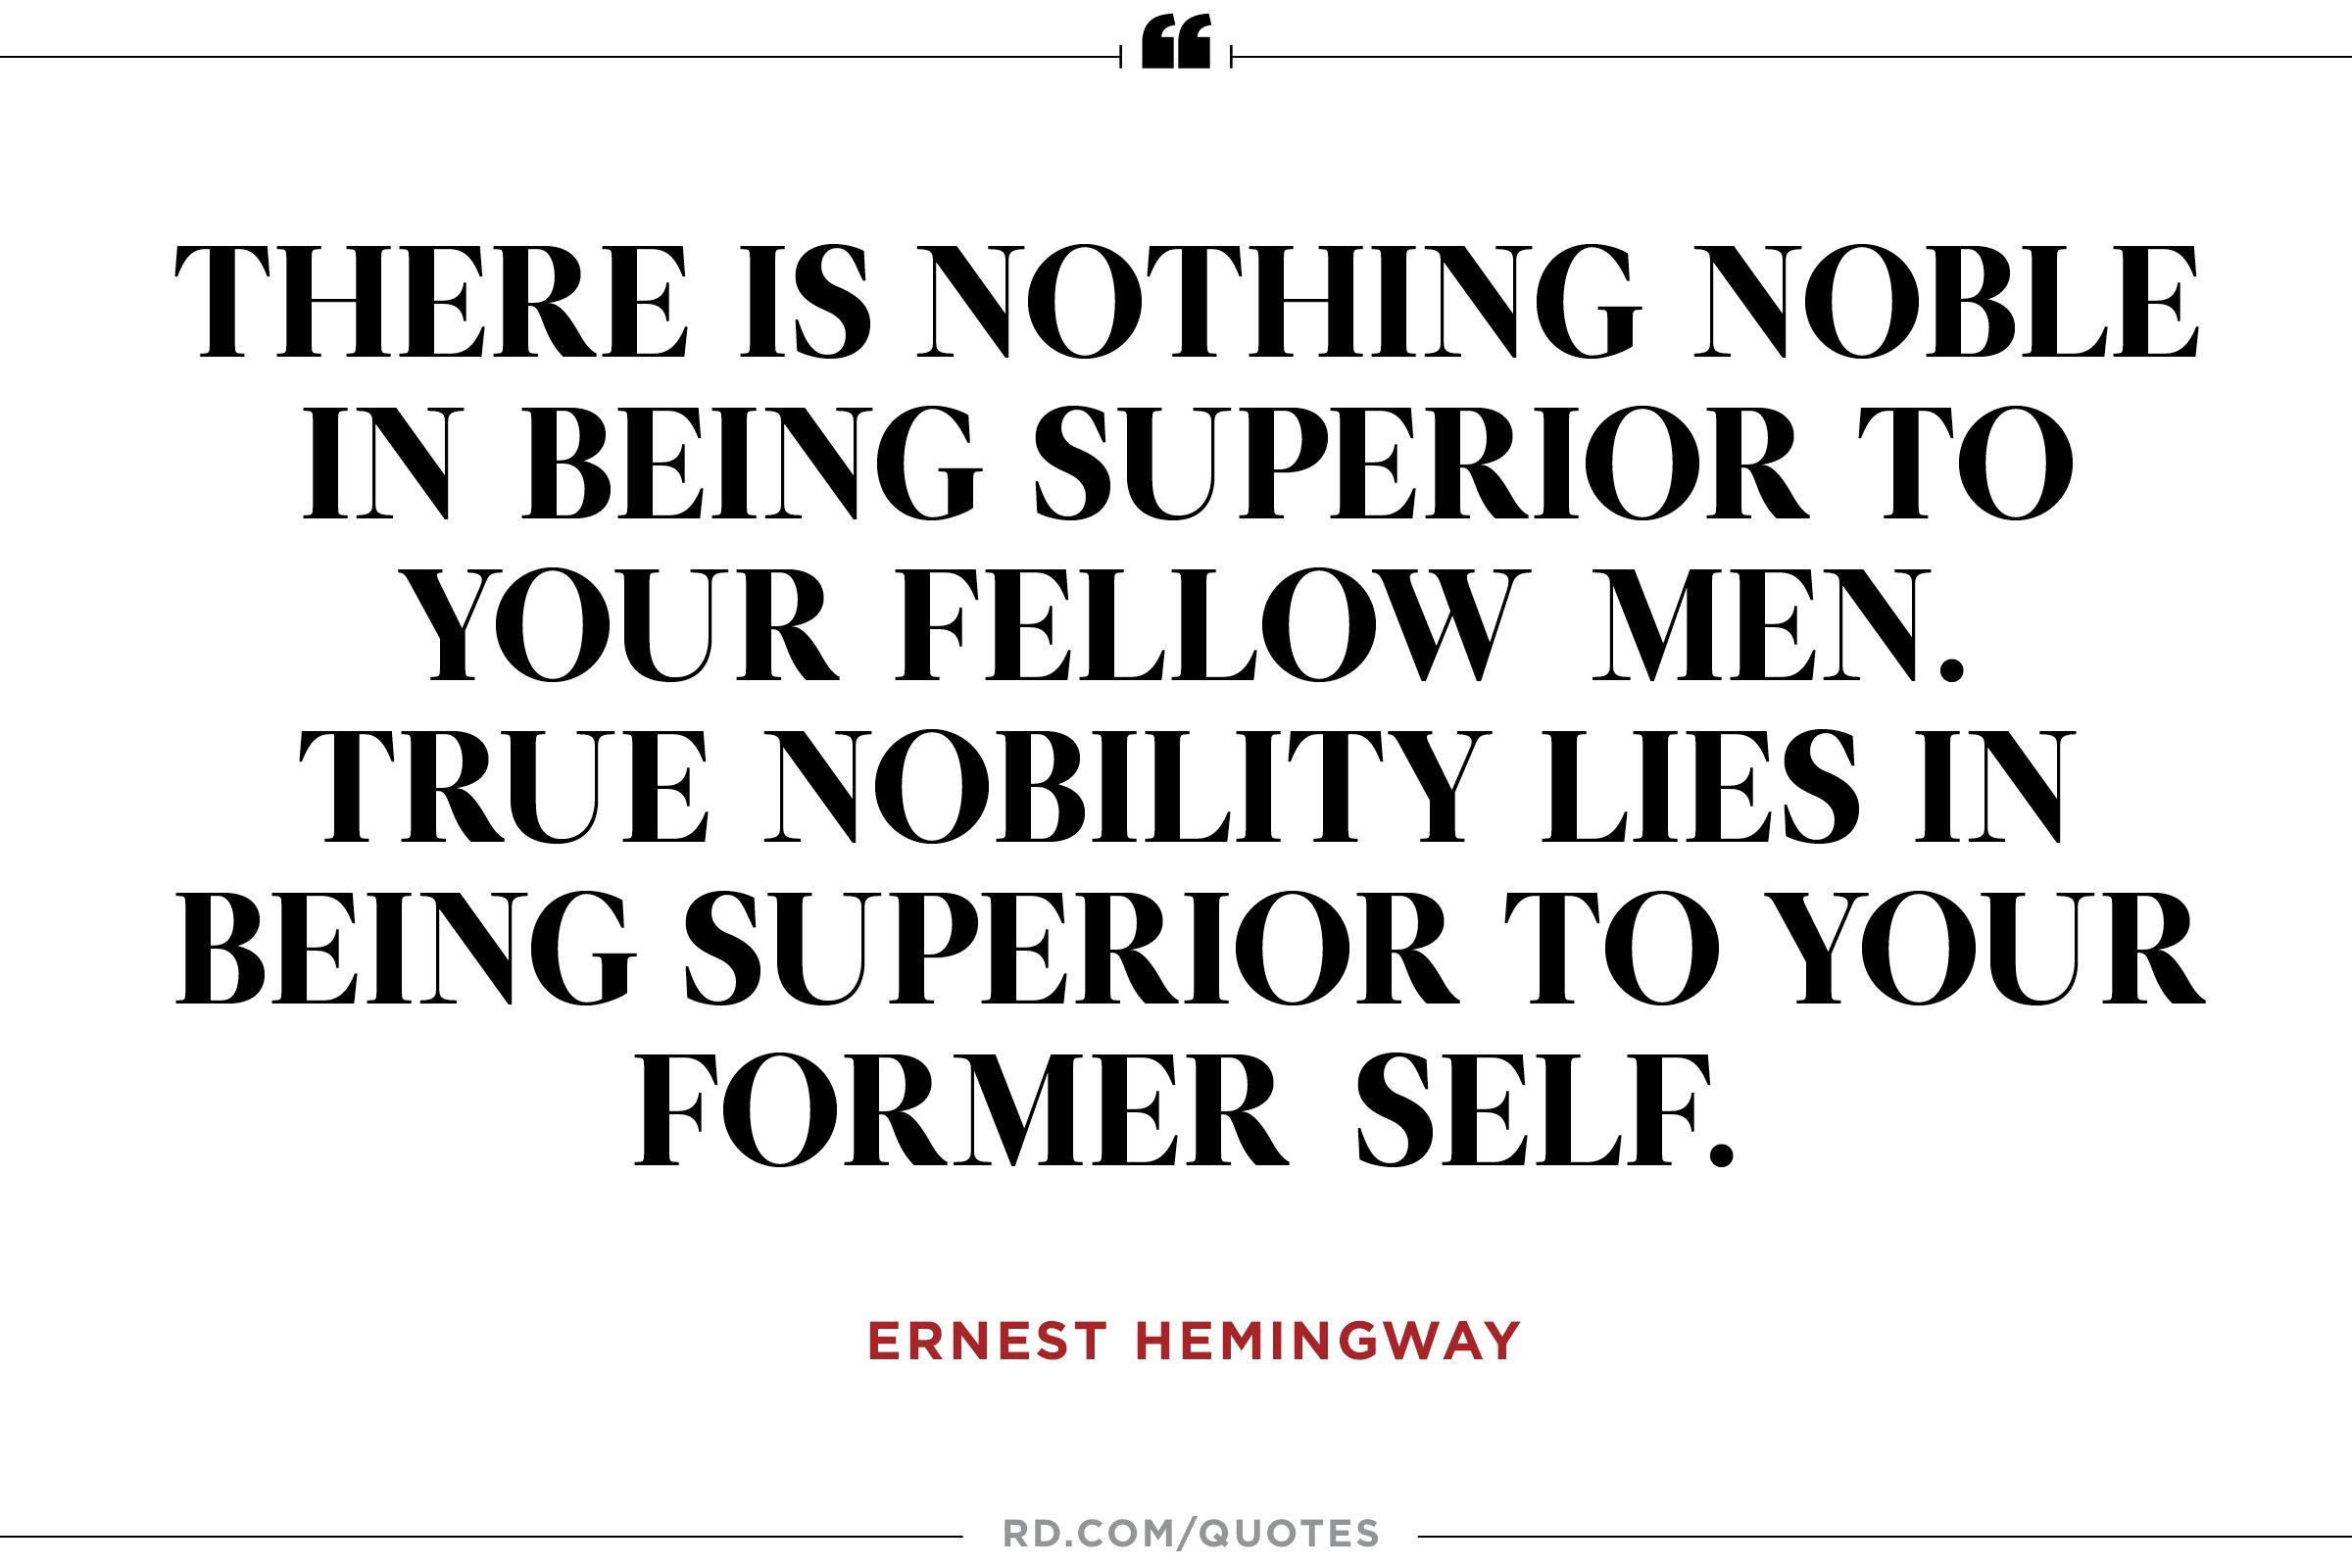 12 Inspiring Ernest Hemingway Quotes | Reader's Digest